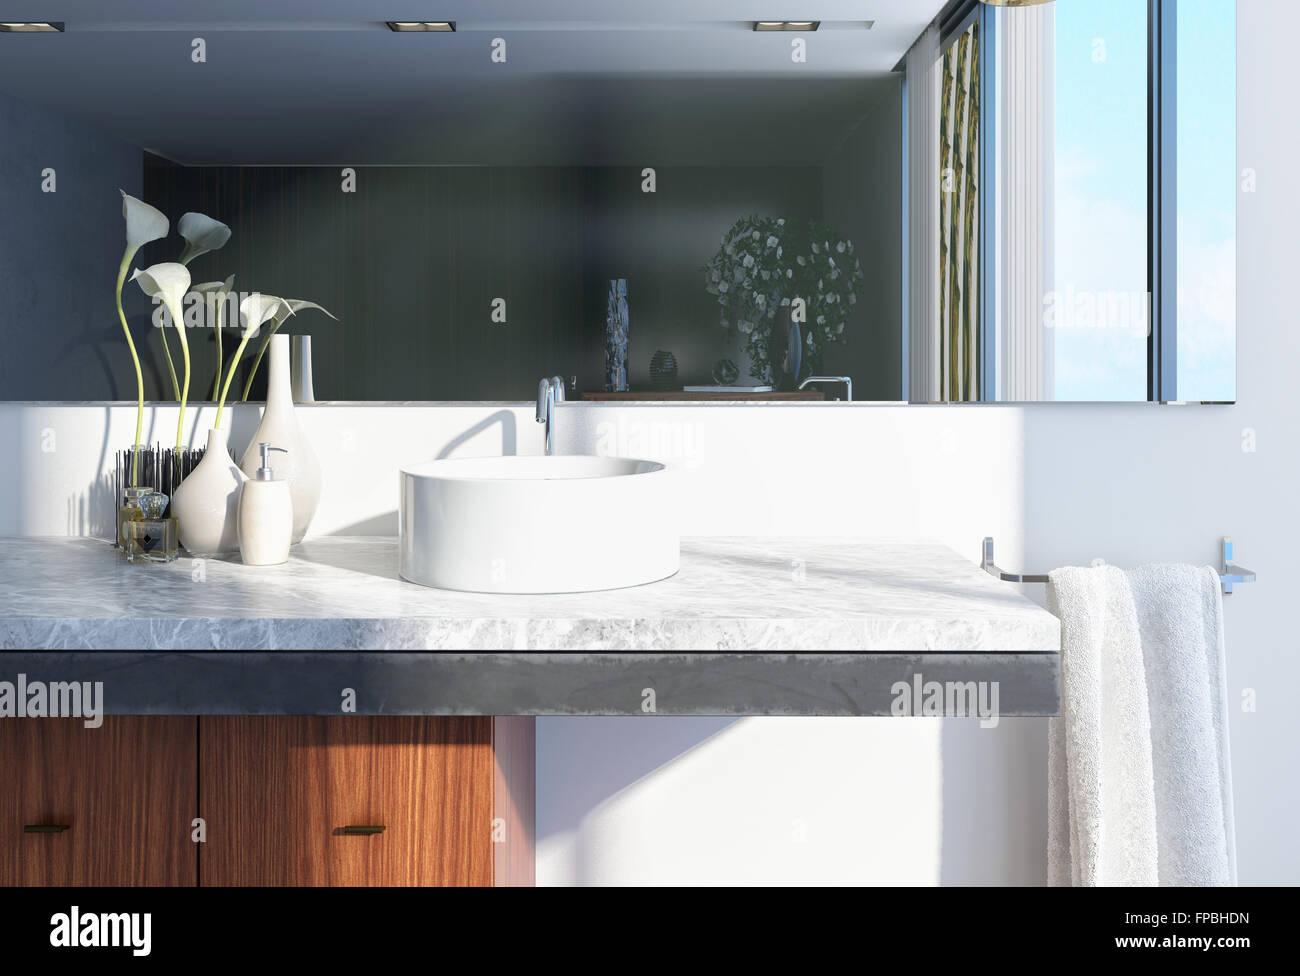 Modern Architectural White Home Washroom Interior Design with ...